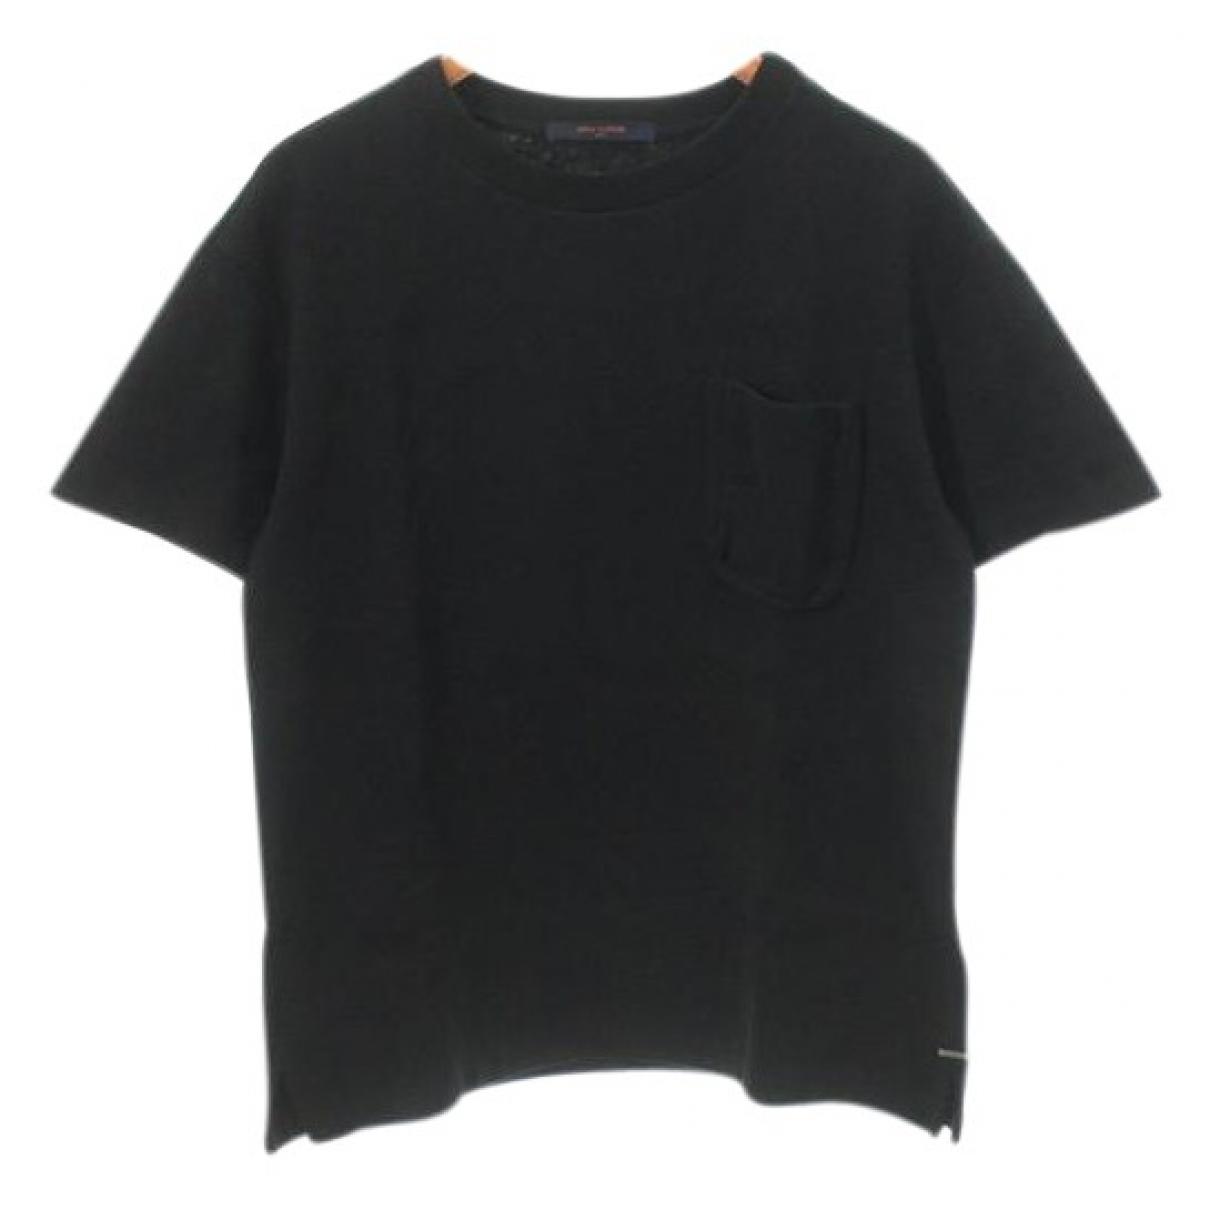 Louis Vuitton \N Black Cotton T-shirts for Men XS International